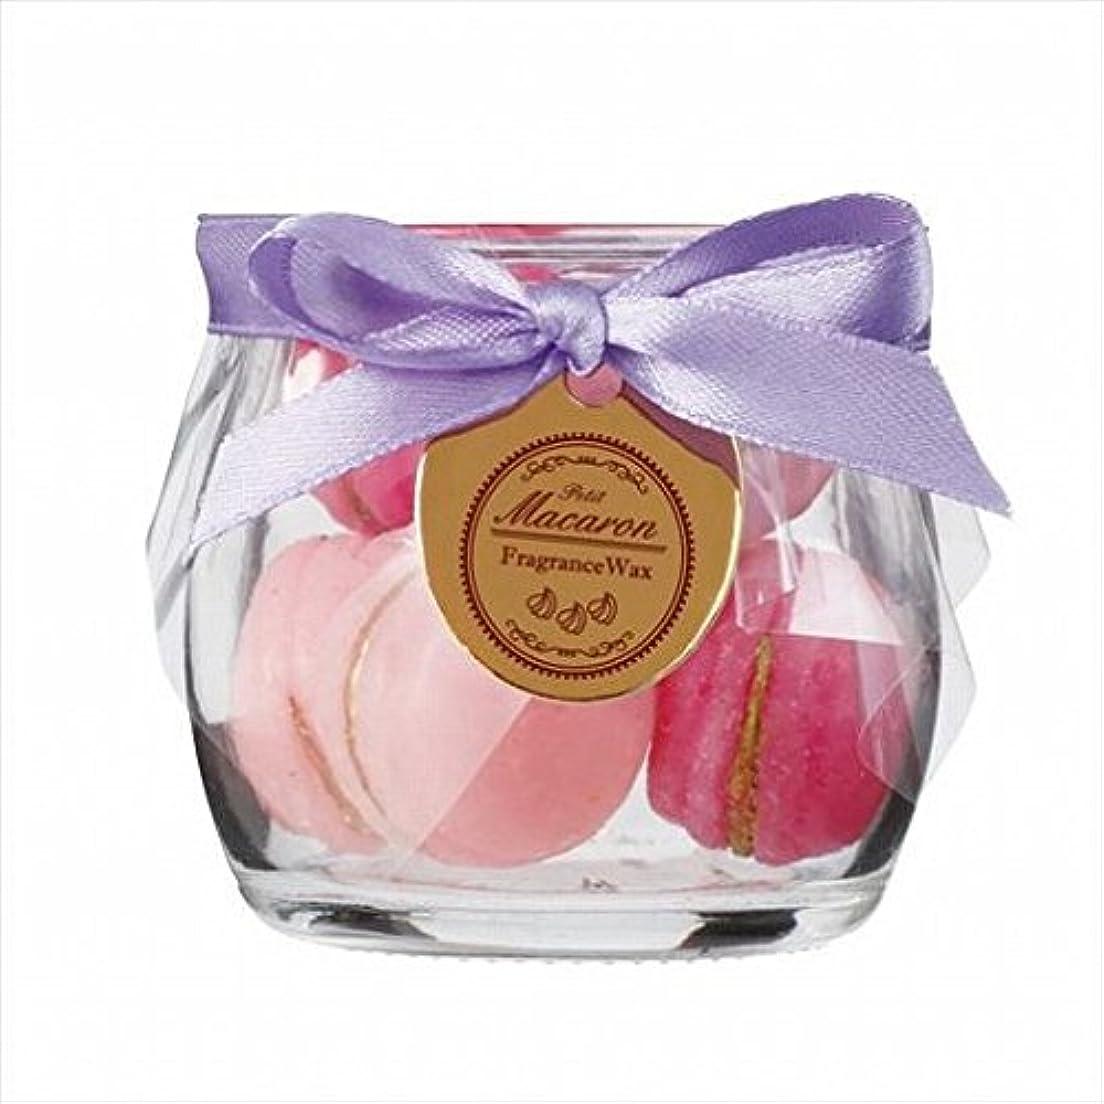 sweets candle(スイーツキャンドル) プチマカロンフレグランス 「 バニラ 」 キャンドル 60x60x56mm (A3160550)